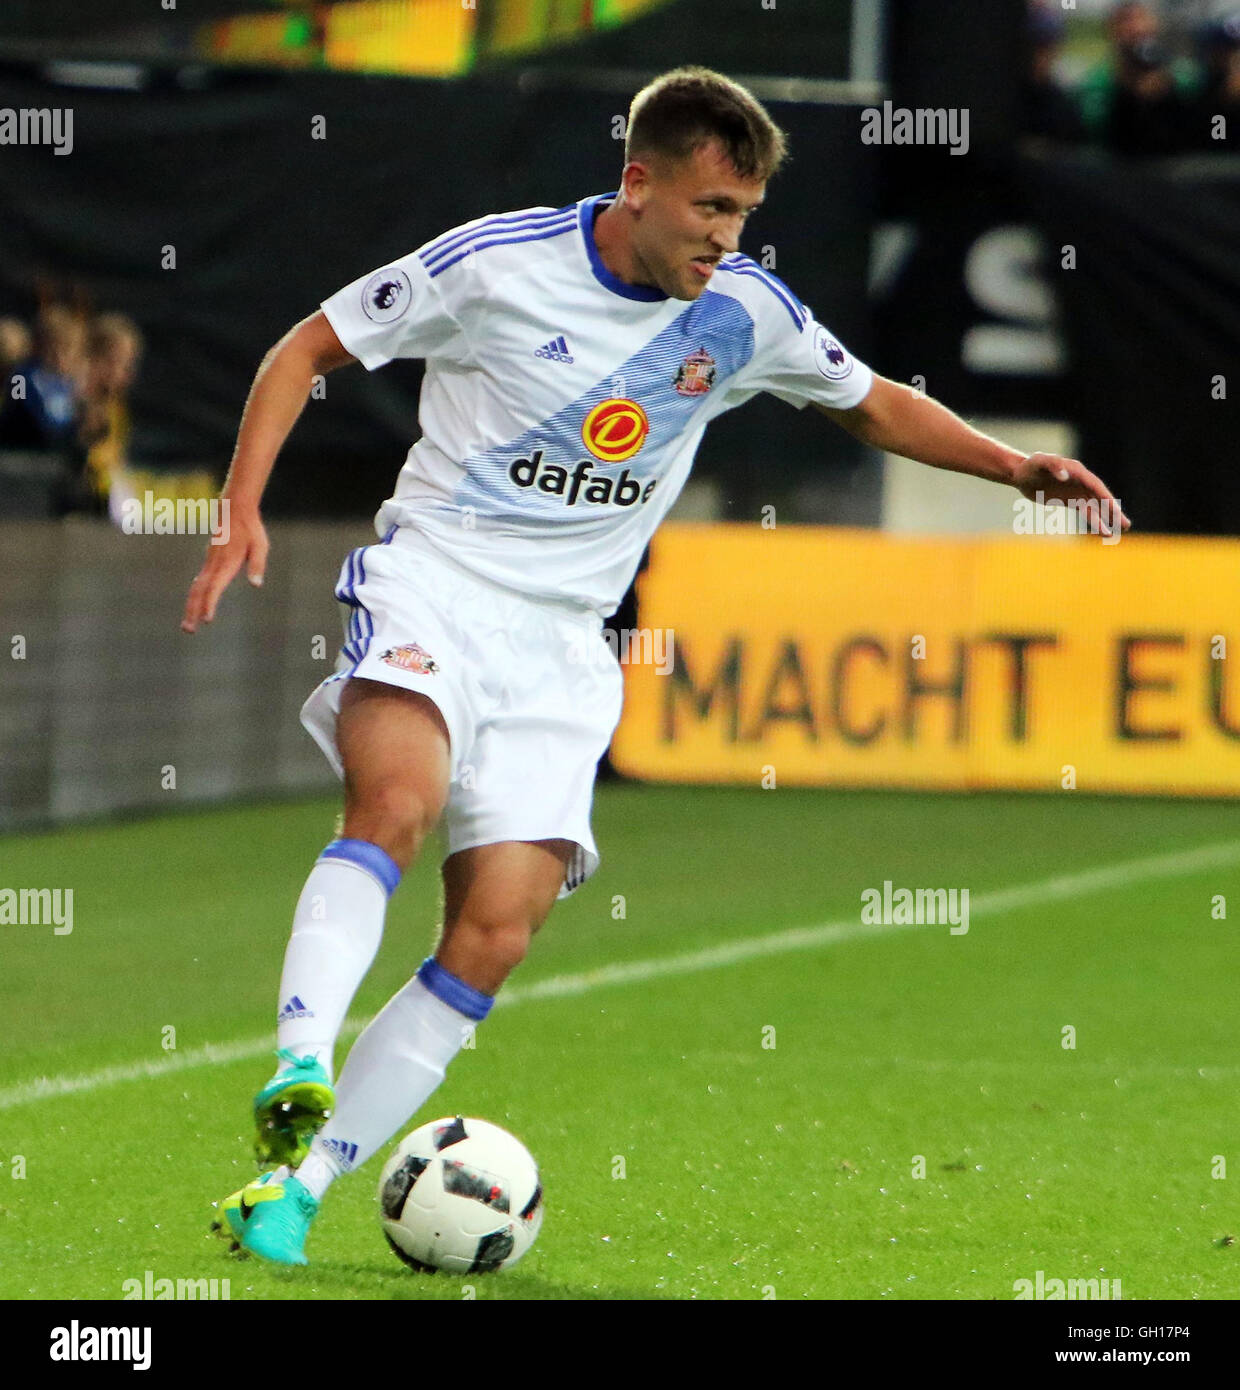 Altach, Bavaria, Germany. 5th Aug, 2016. Josh ROBSON (Sunderland).pre season friendly.Borussia Dortmund vs Sunderland - Stock Image